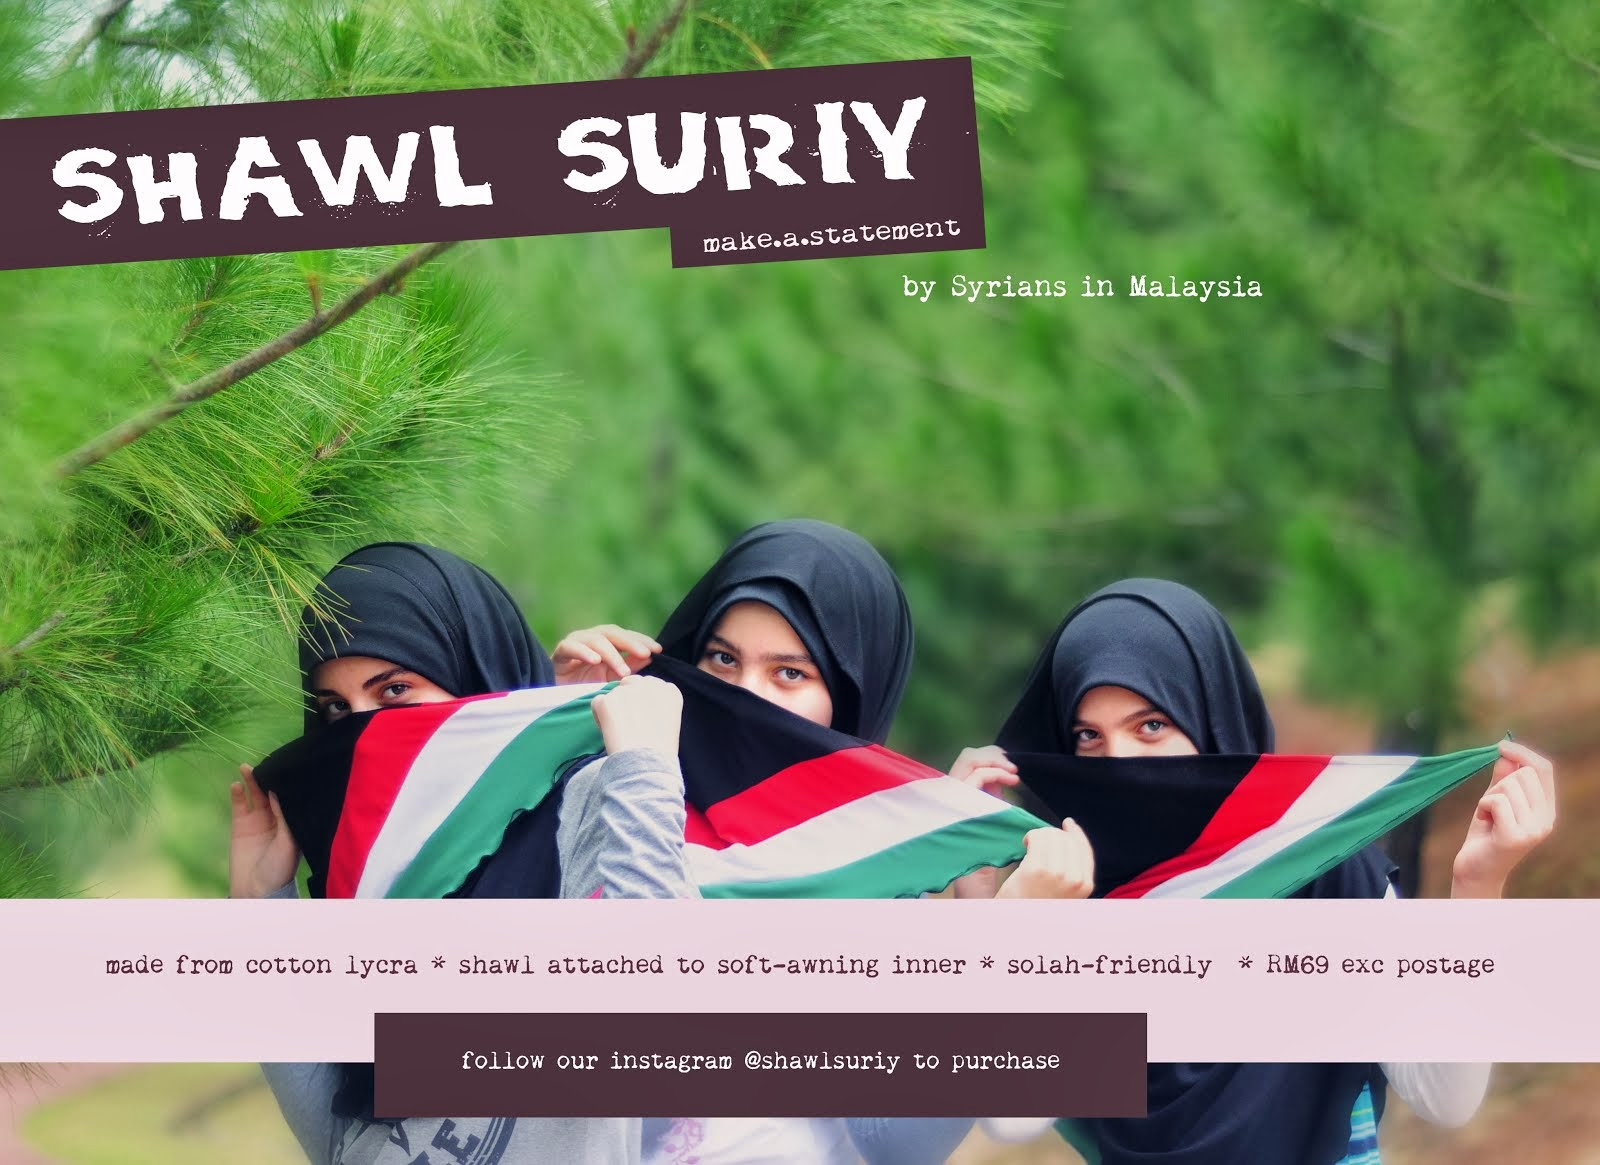 ShawlSuriy